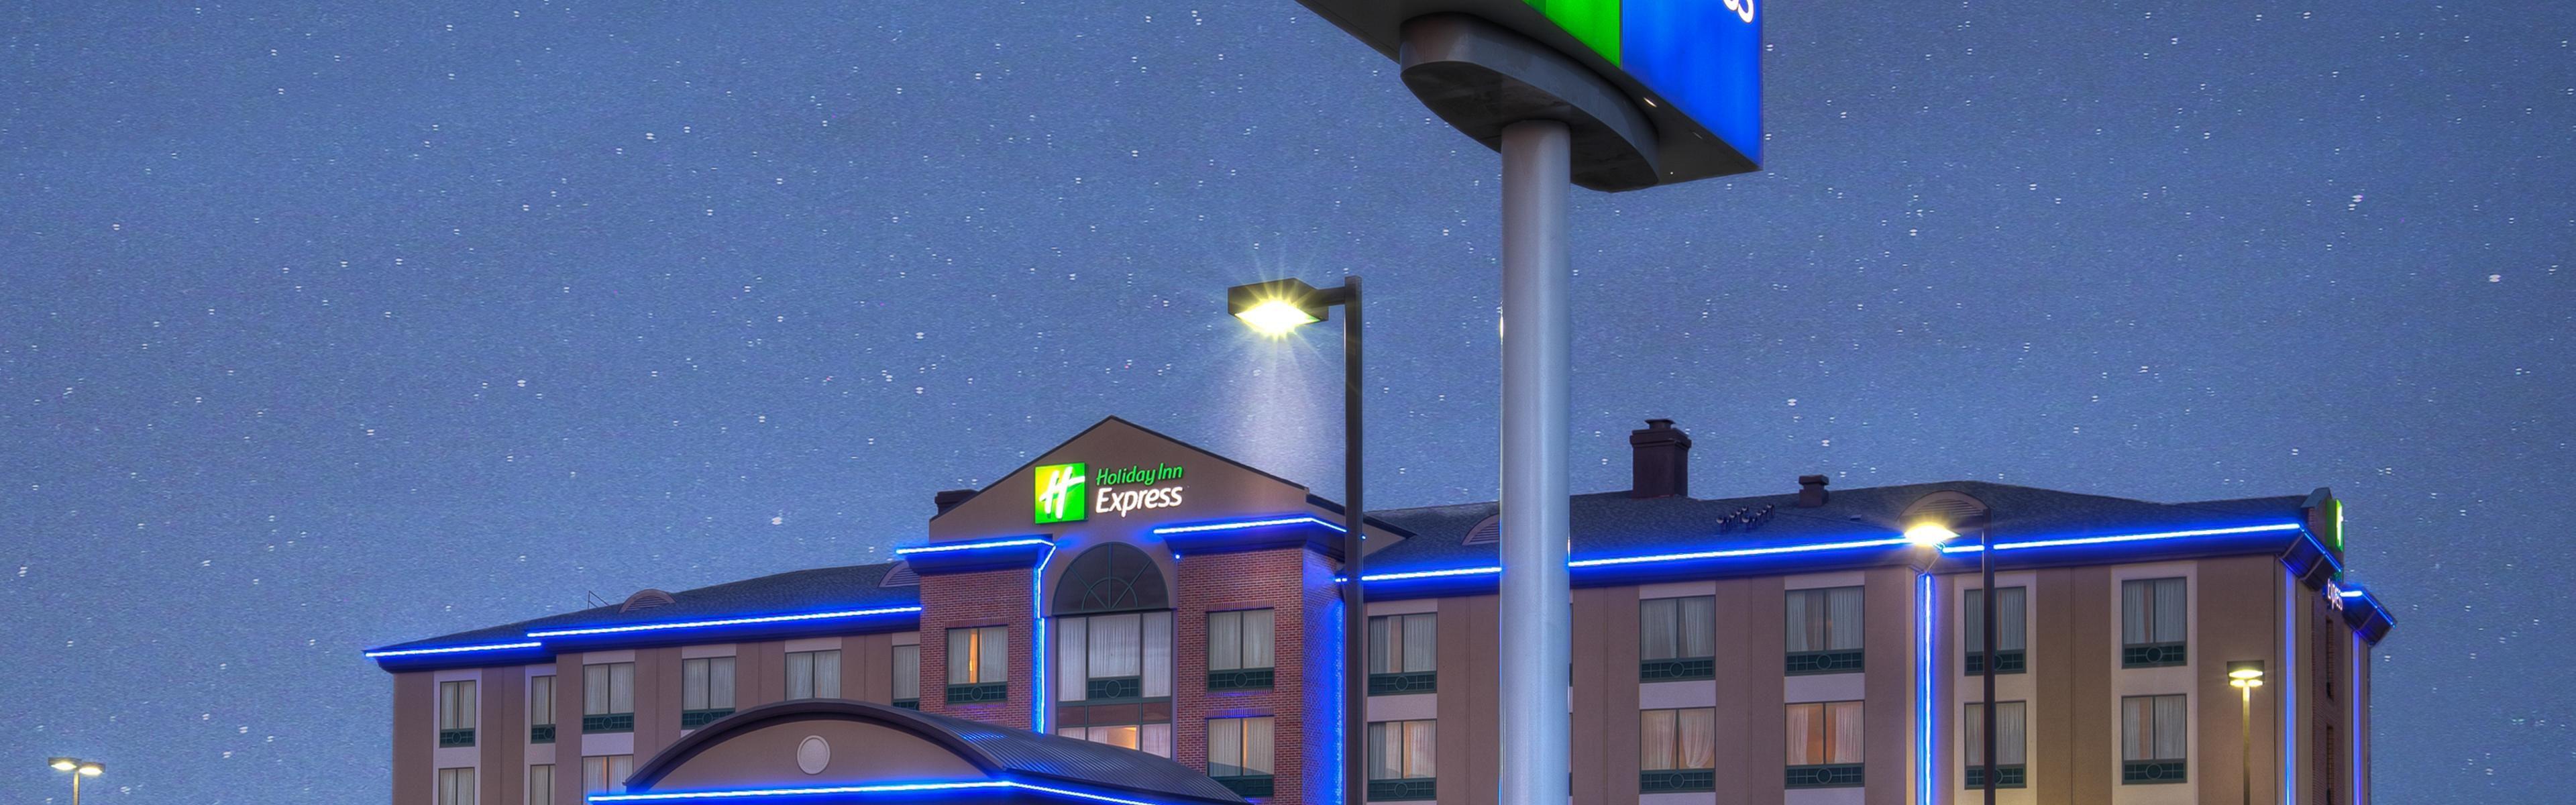 Holiday Inn Express Wichita South image 0